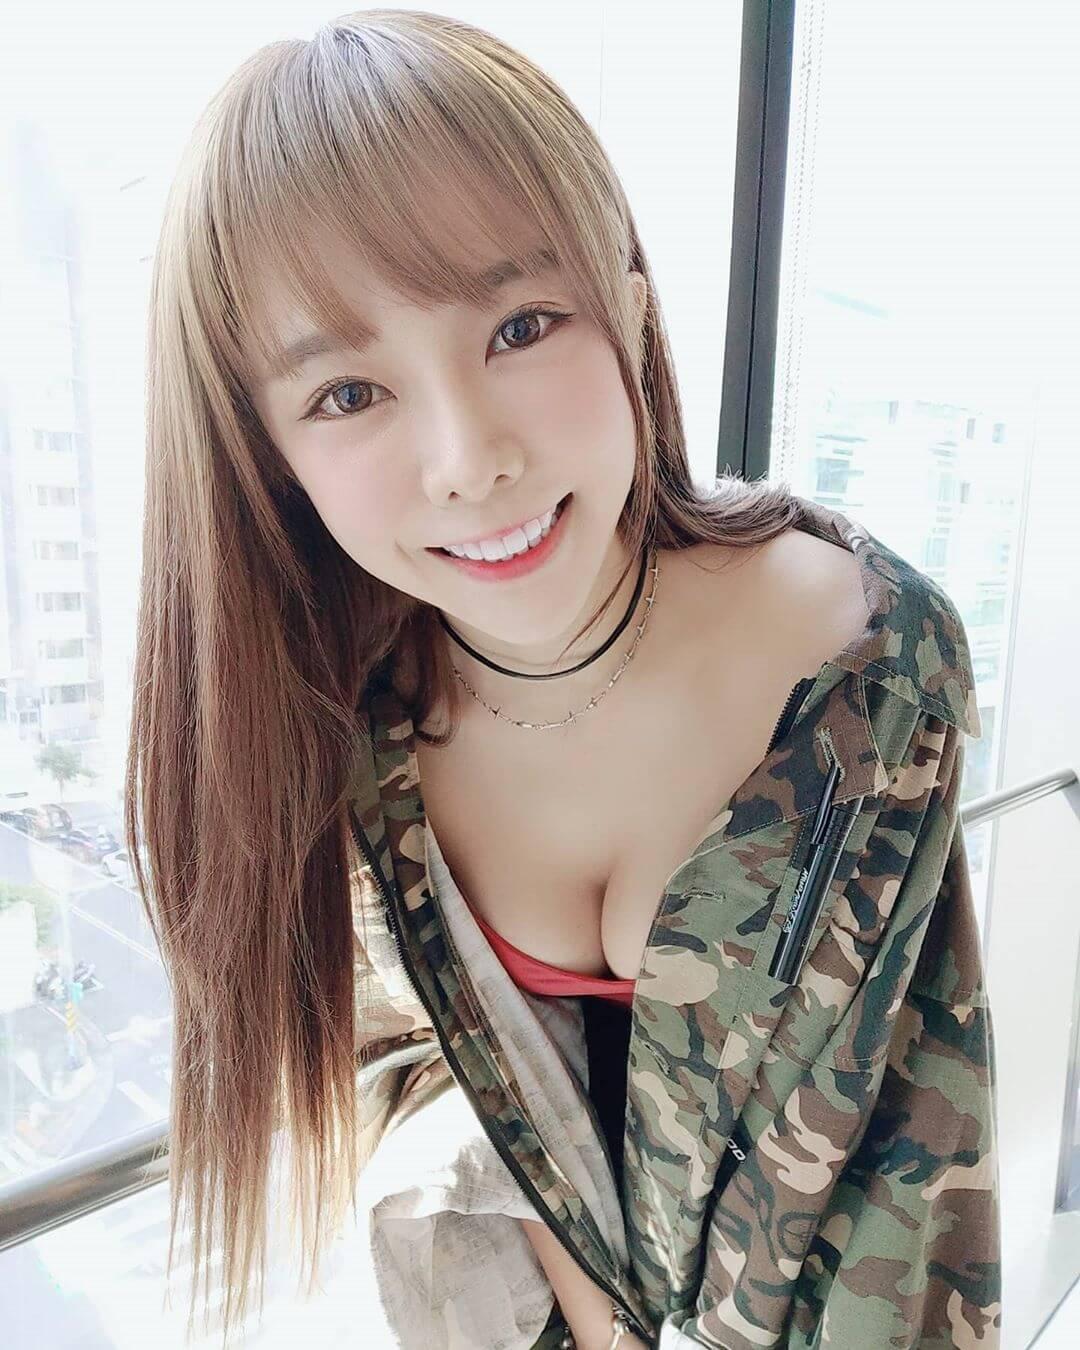 巫苡萱 Ava Wu